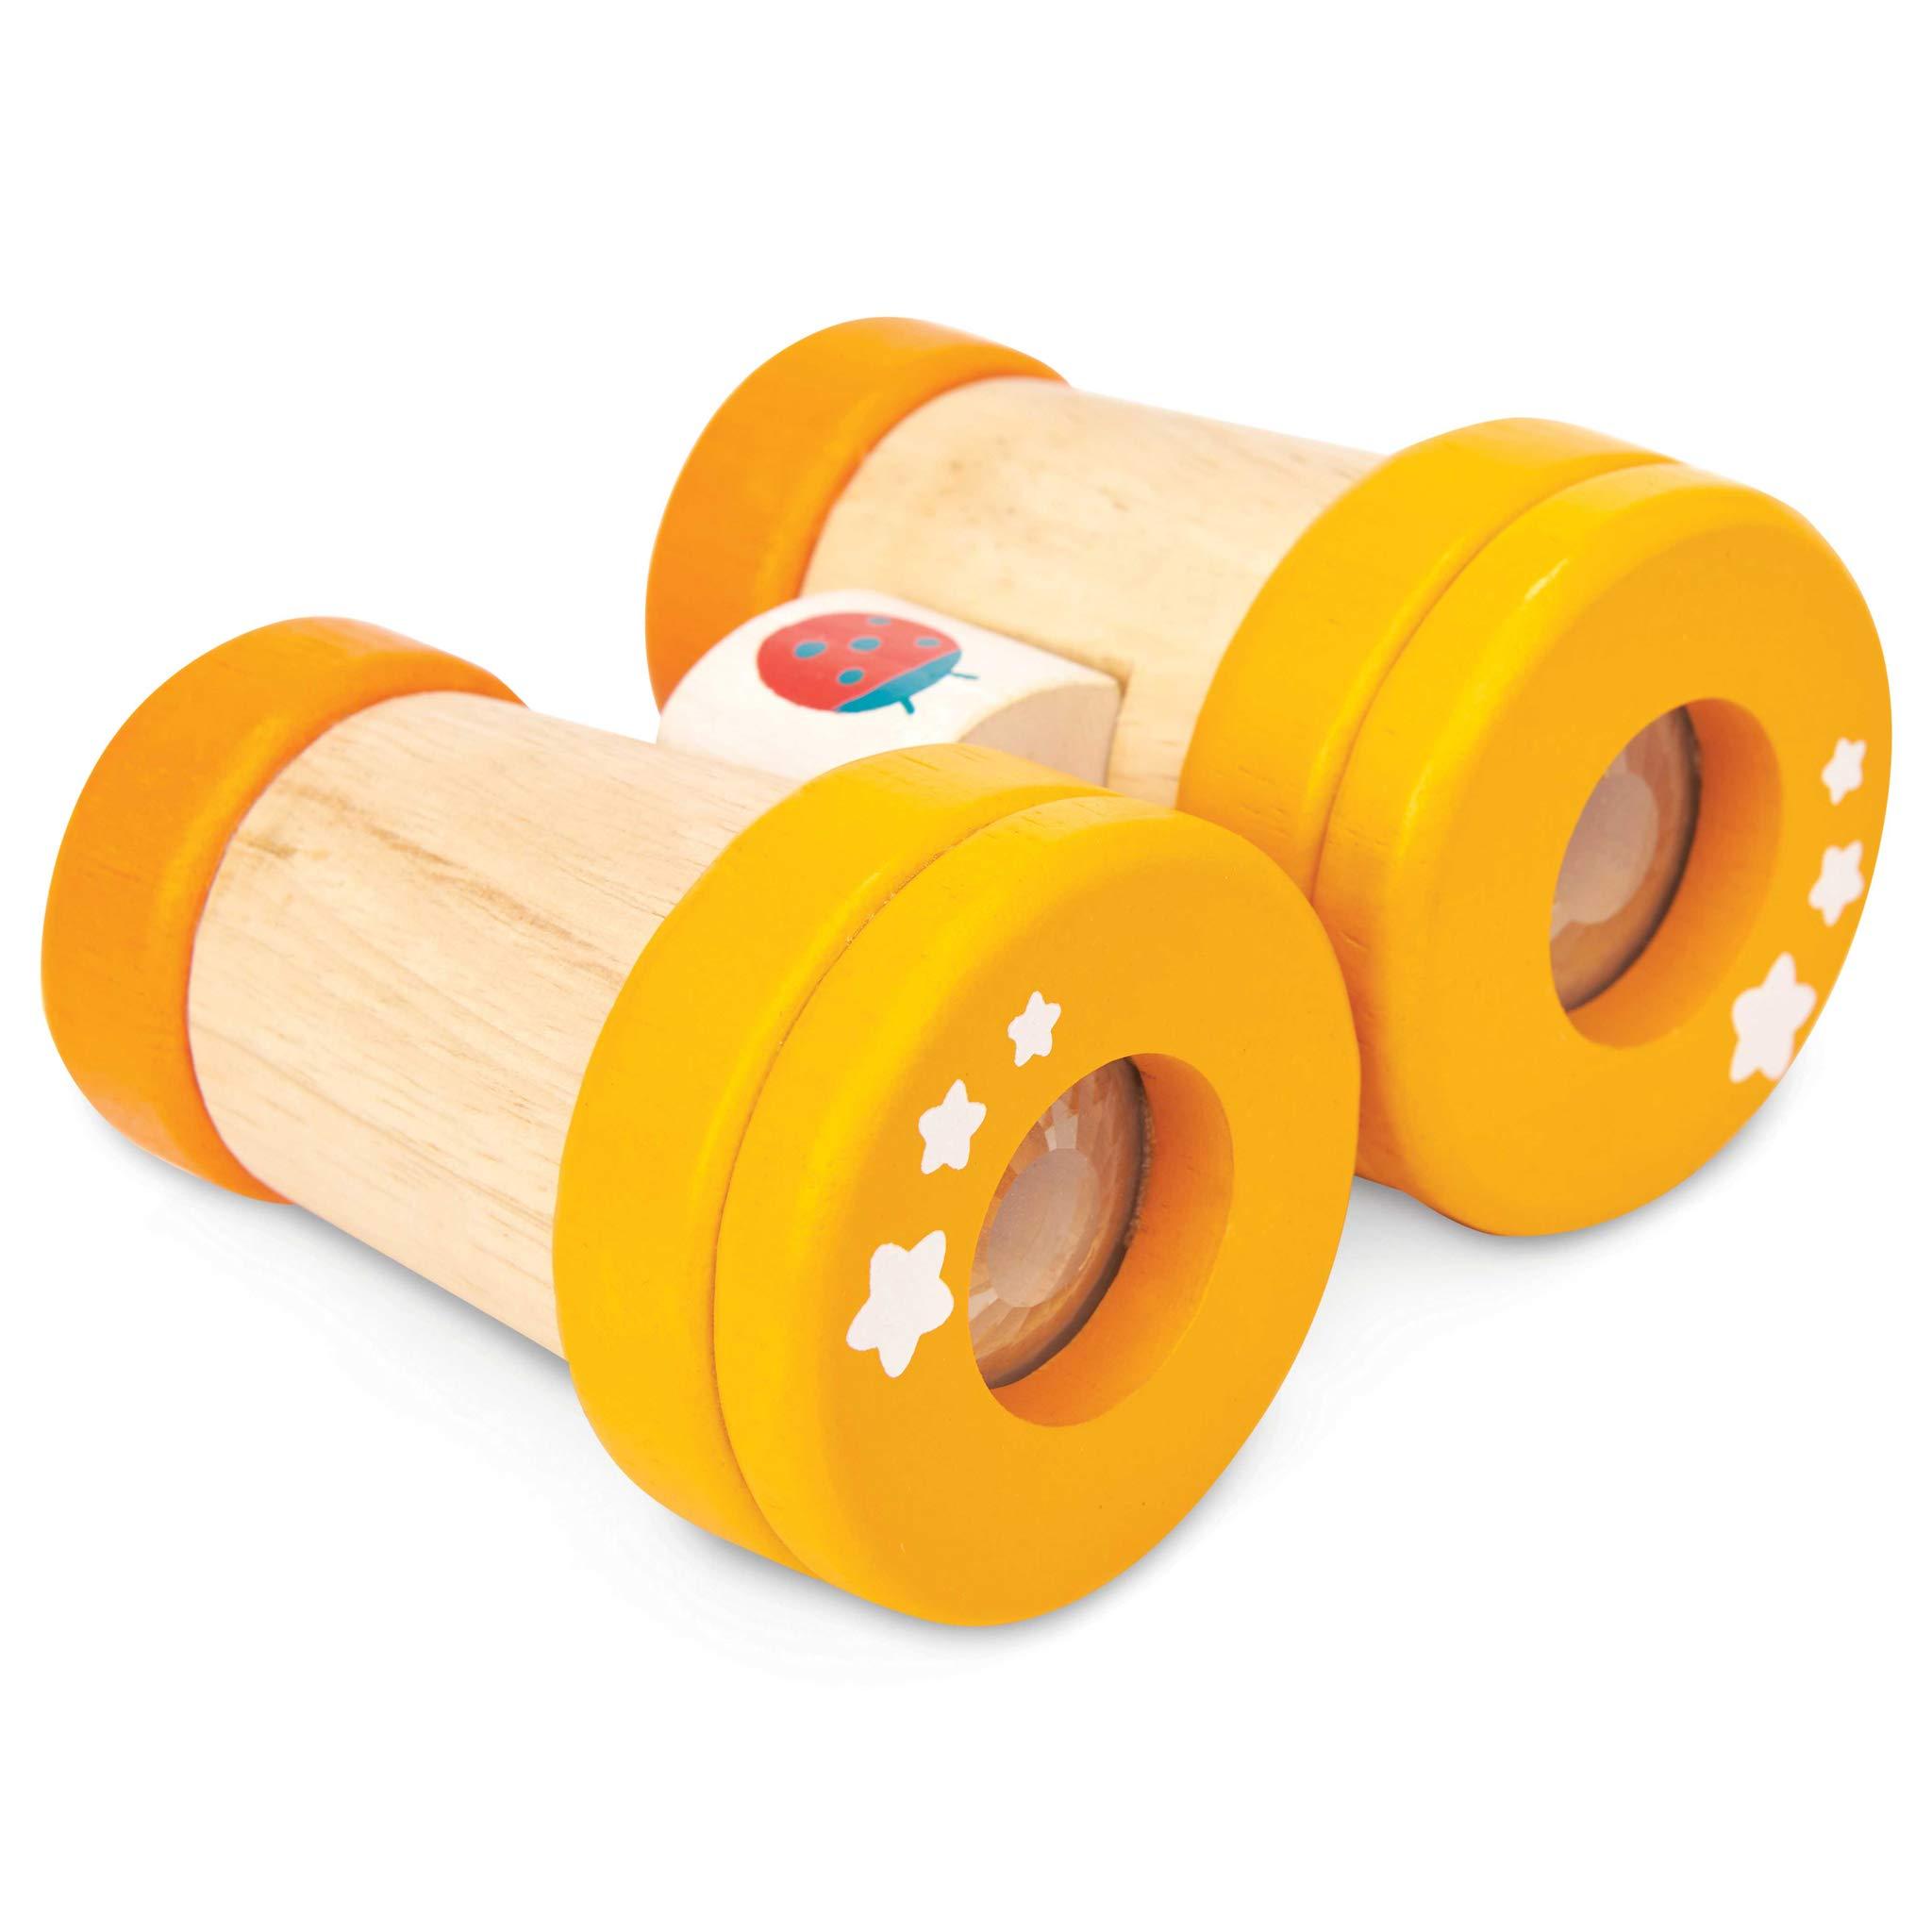 Le Toy Van Lady Bird Binoculars Yellow by Le Toy Van